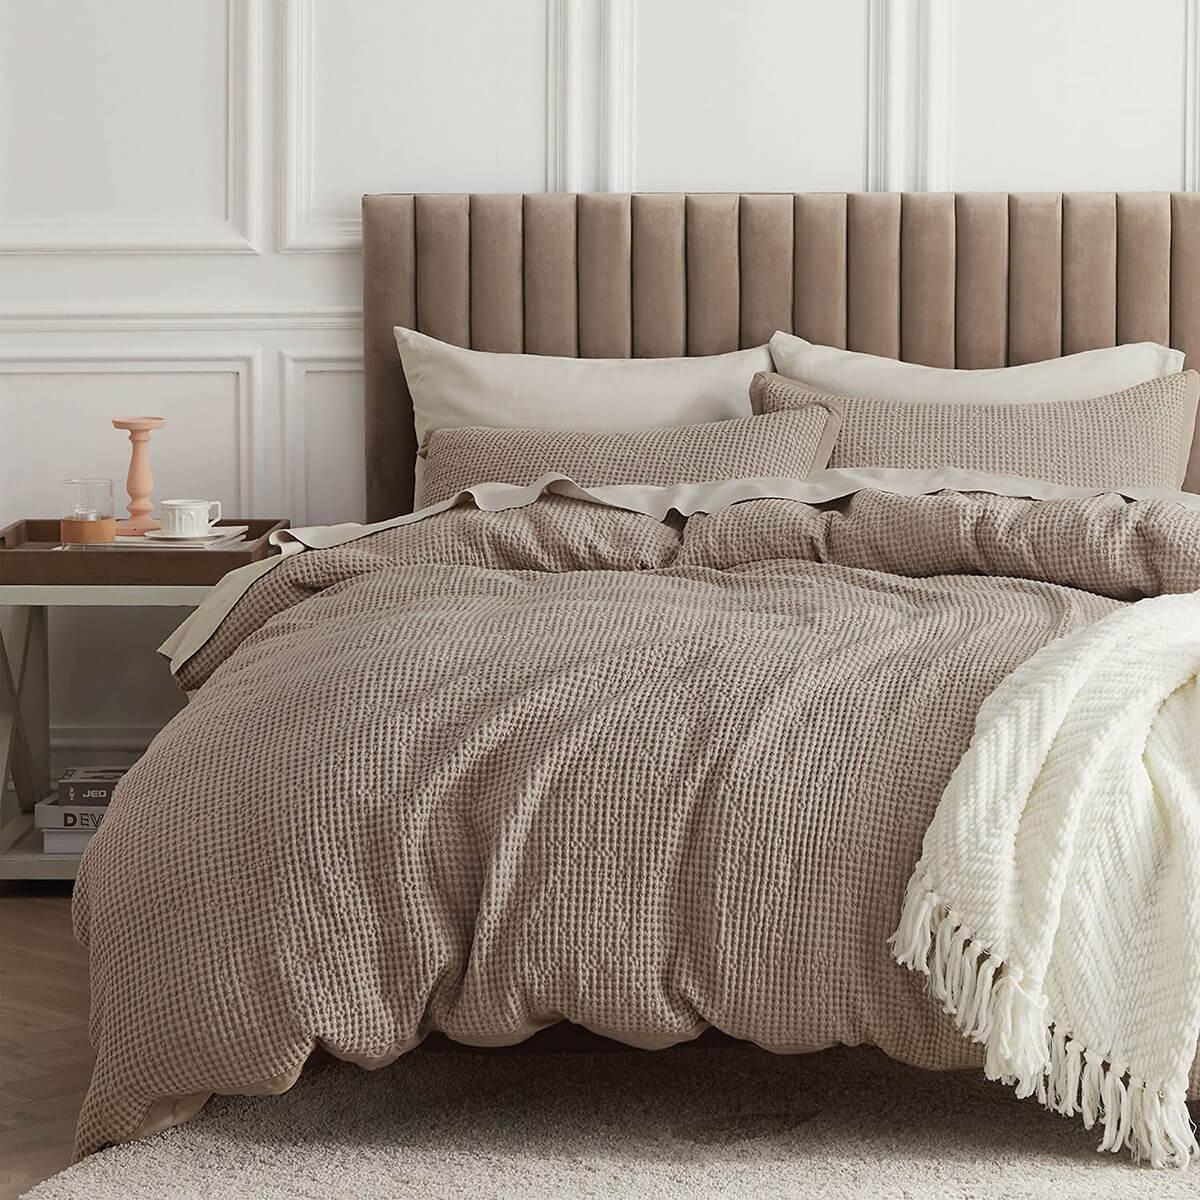 Wonderful Waffle Weave Cotton Duvet by Bedsure